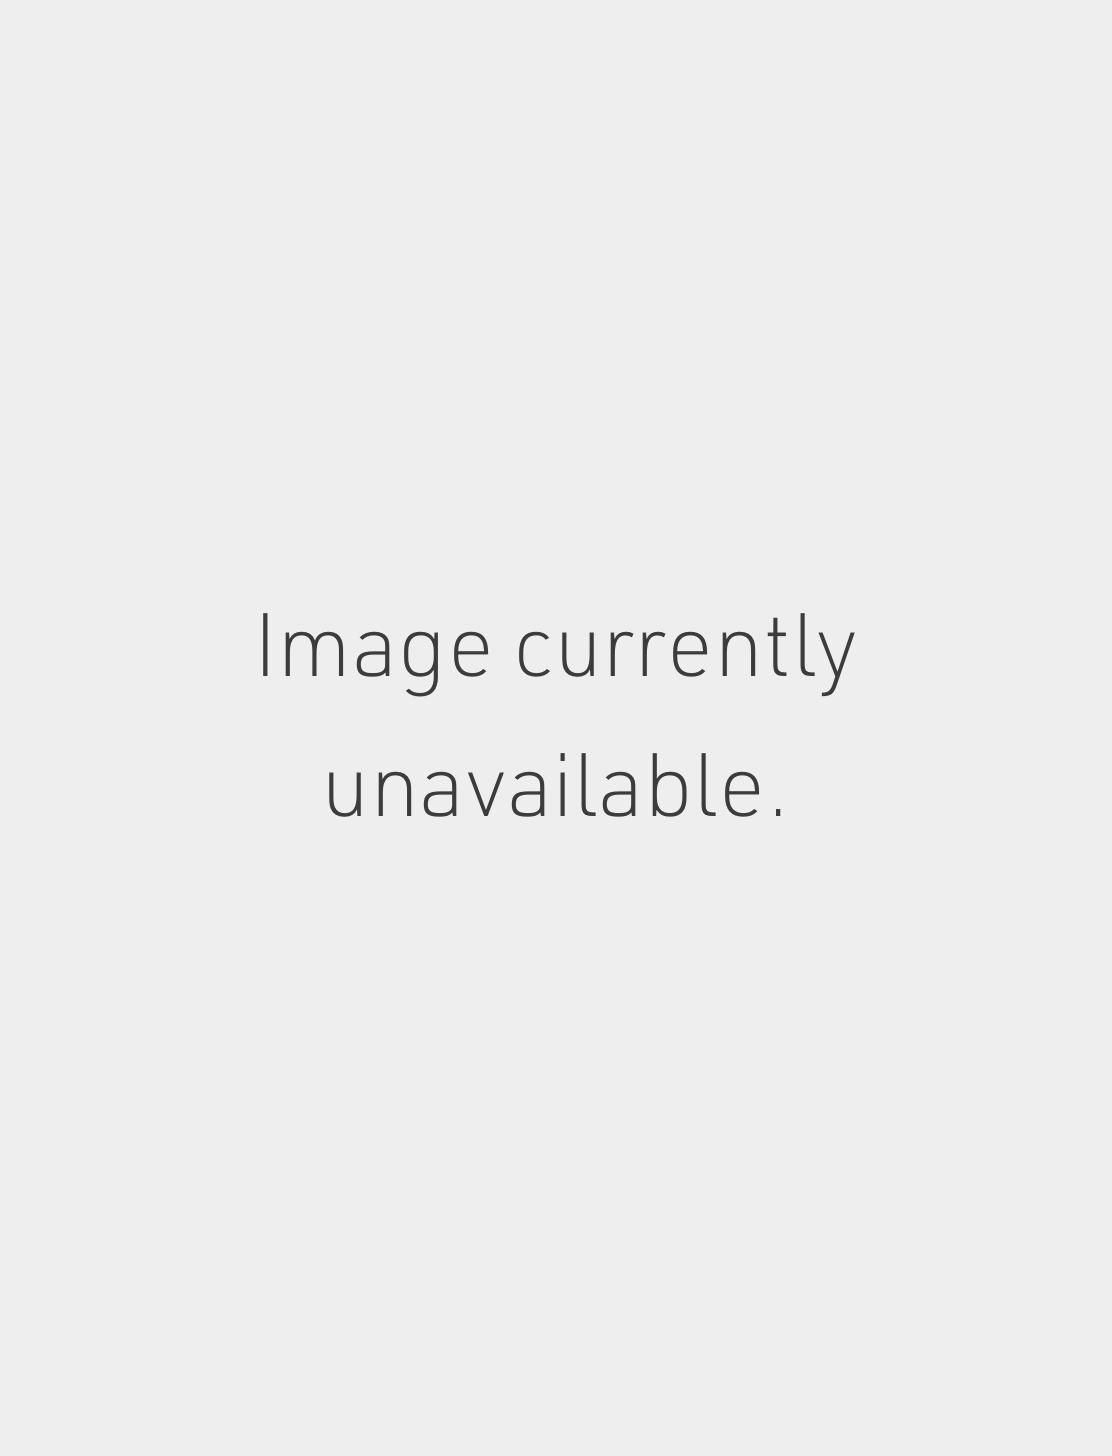 5mm Black and White Diamond Pave Pronged Ouroboros Traditional Stud Image #1